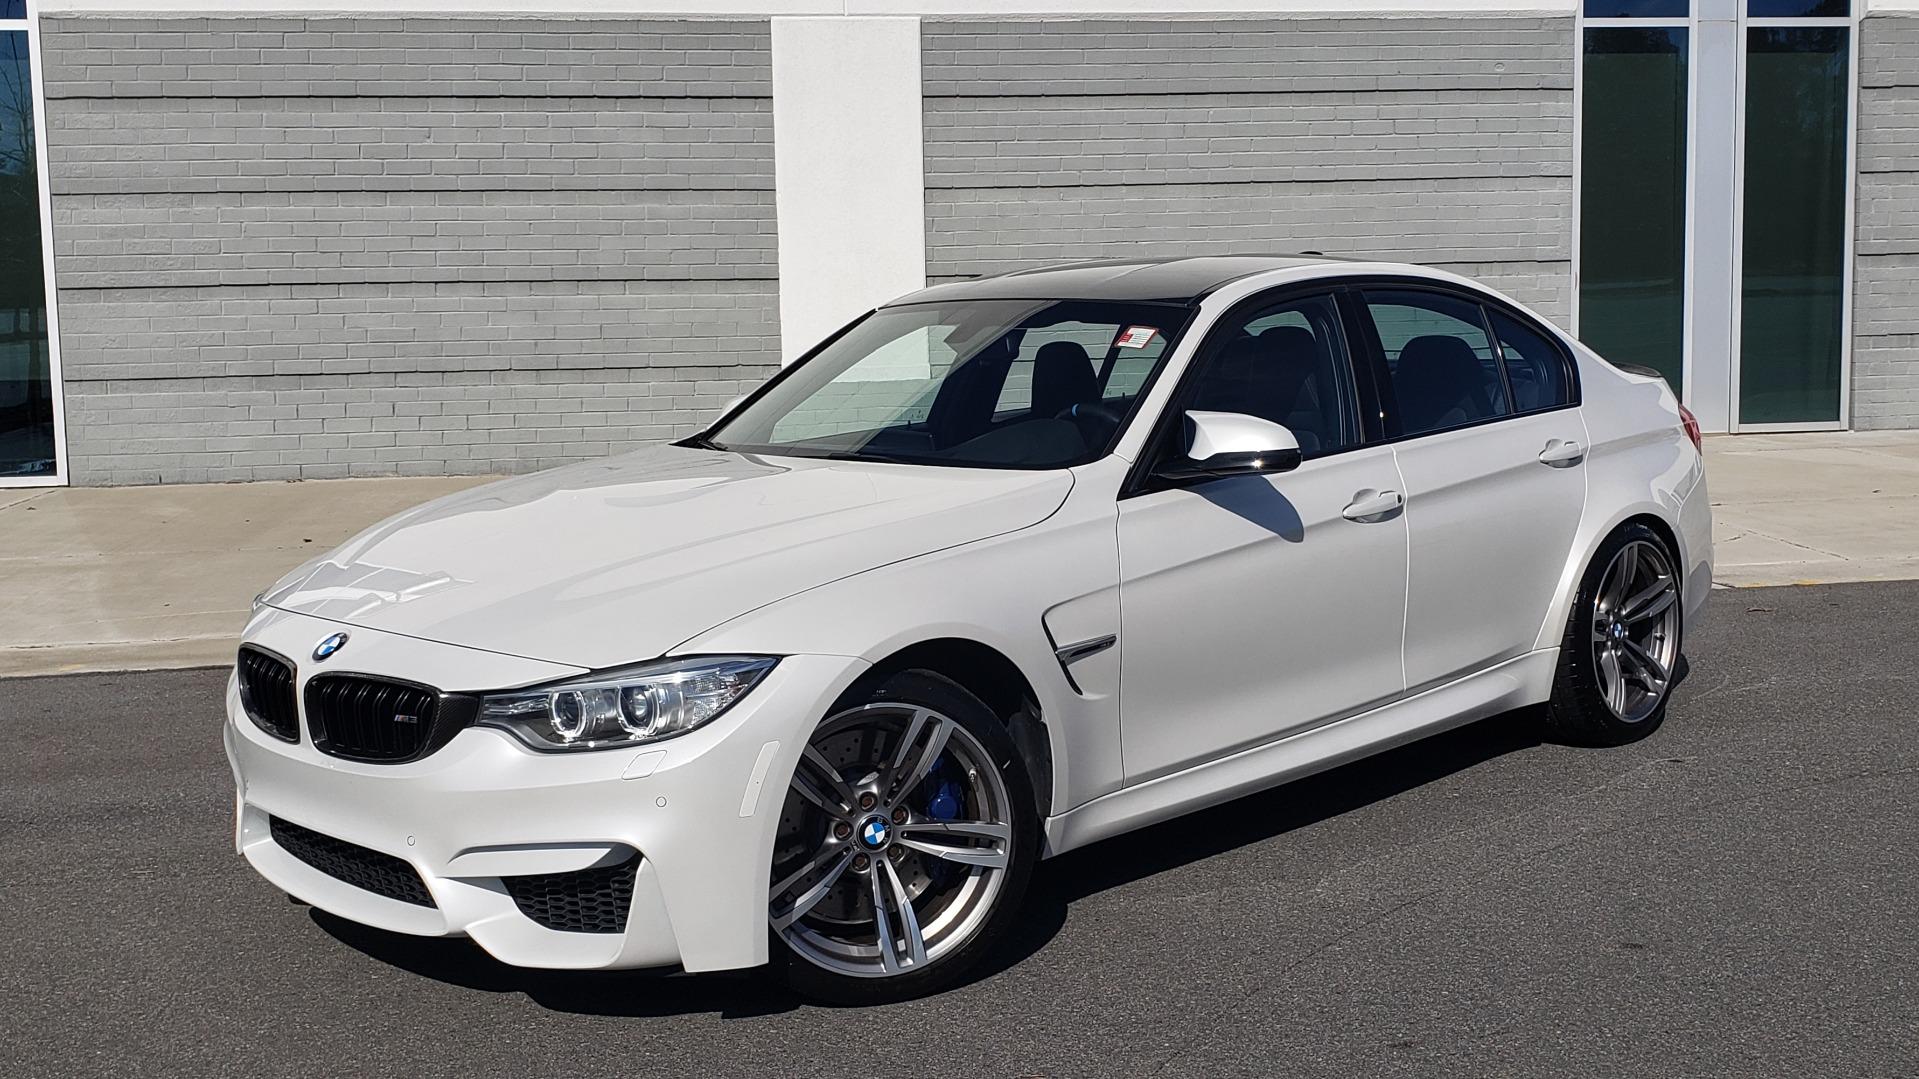 Used 2016 BMW M3 SEDAN / EXECUTIVE PKG / M-SUSPENSION / HARMAN/KARDON SOUND for sale Sold at Formula Imports in Charlotte NC 28227 1